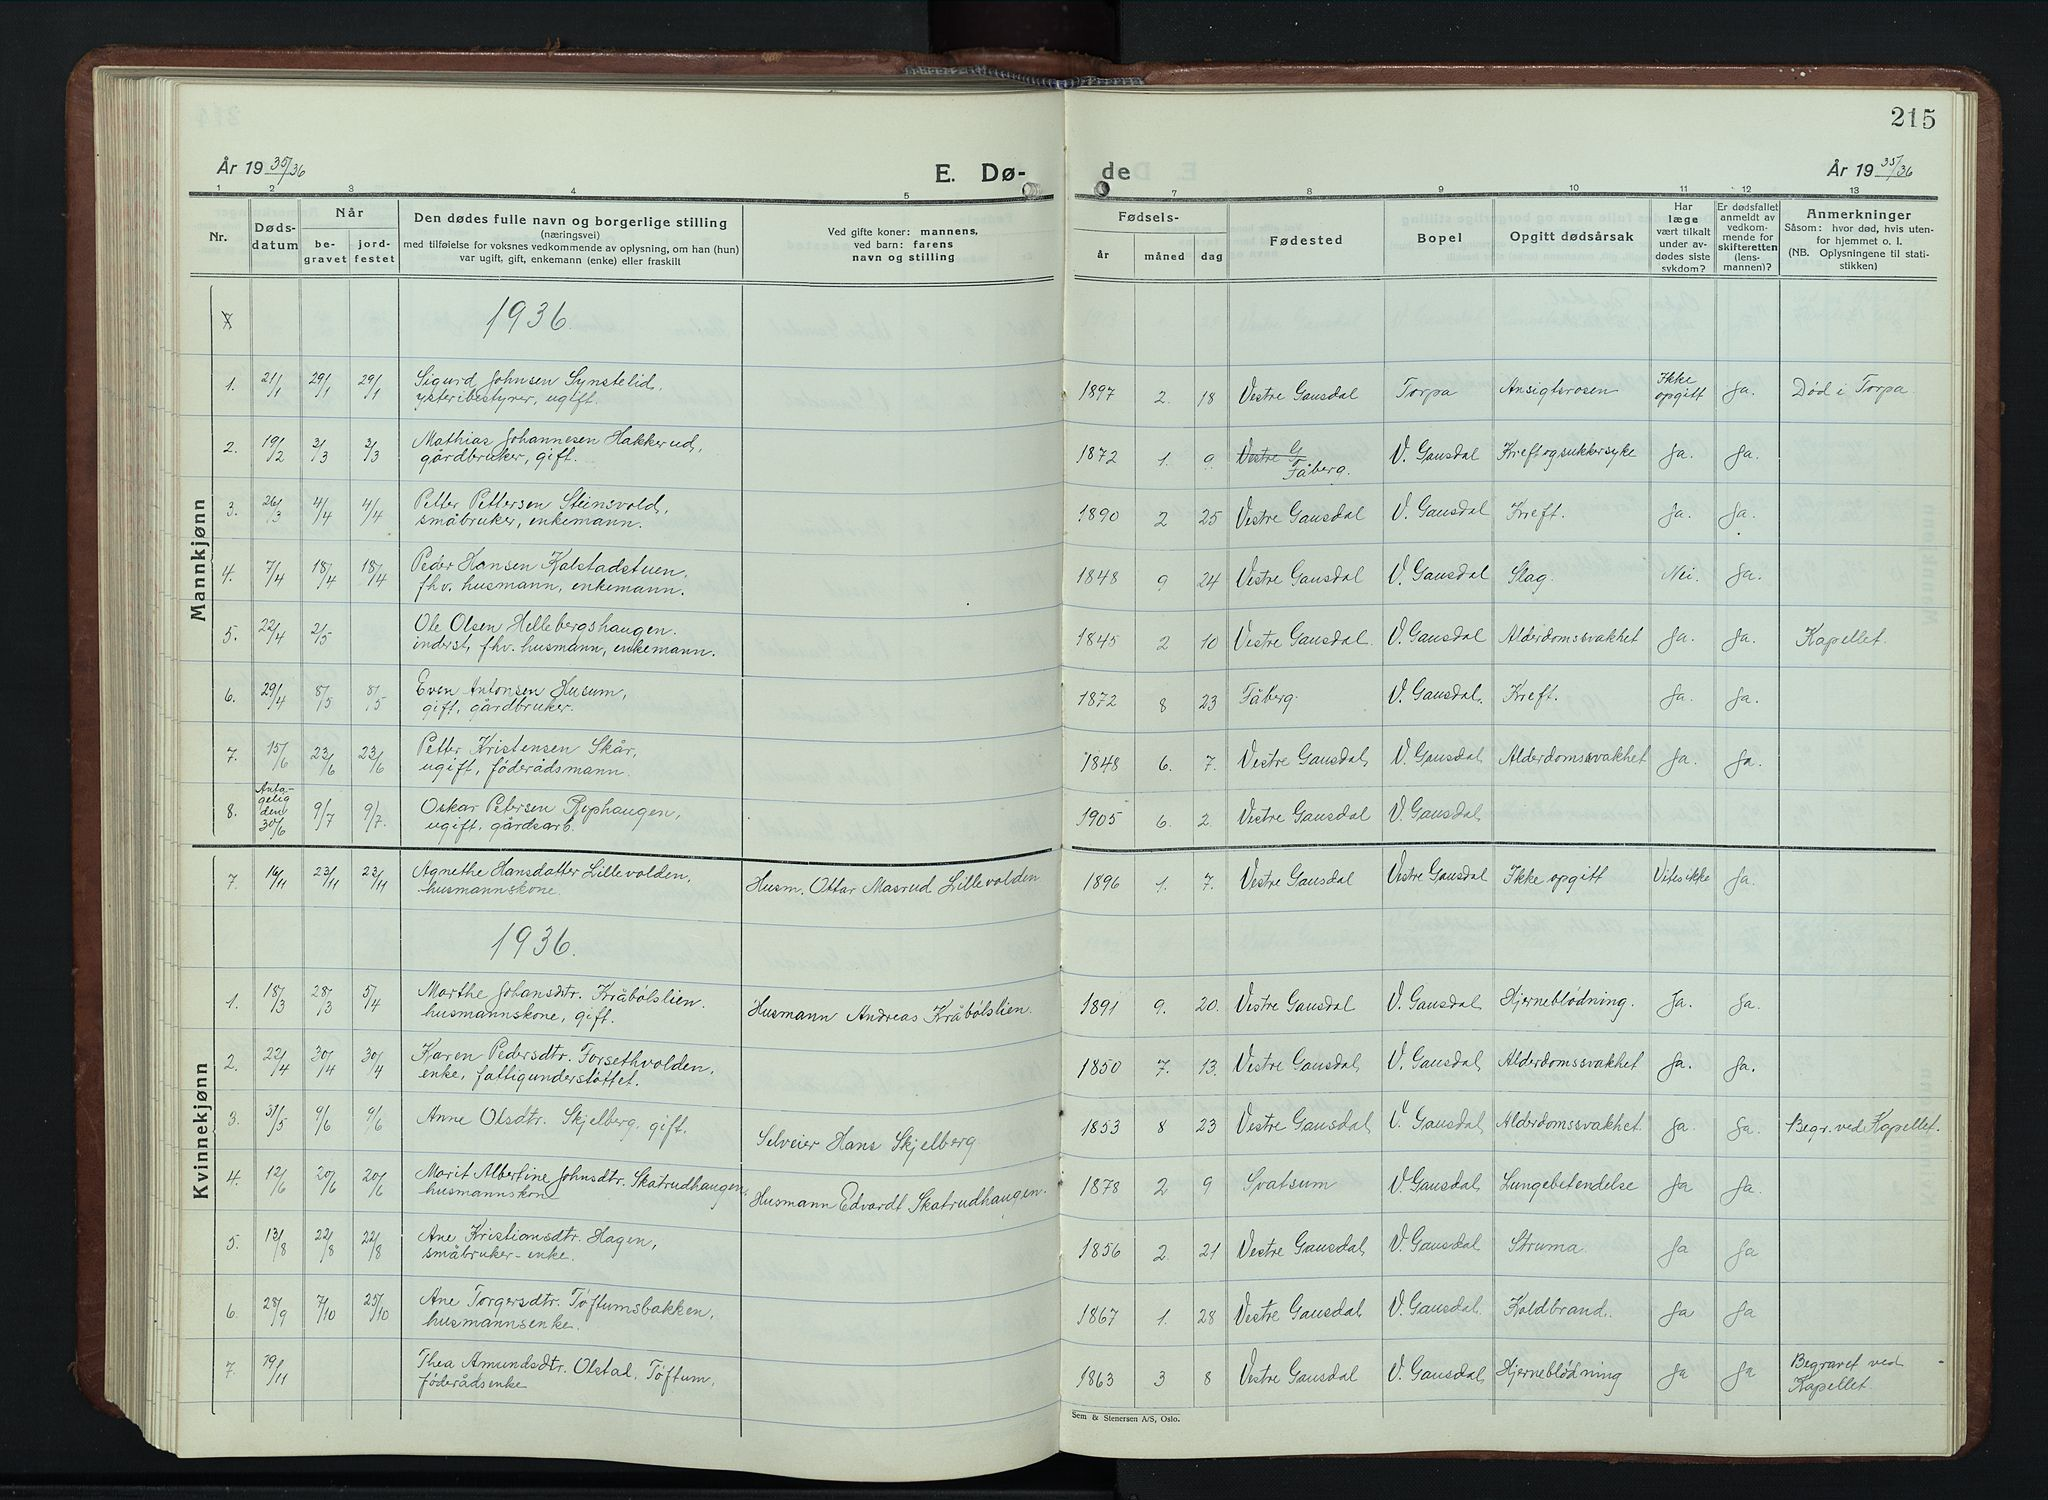 SAH, Vestre Gausdal prestekontor, Klokkerbok nr. 5, 1926-1955, s. 215